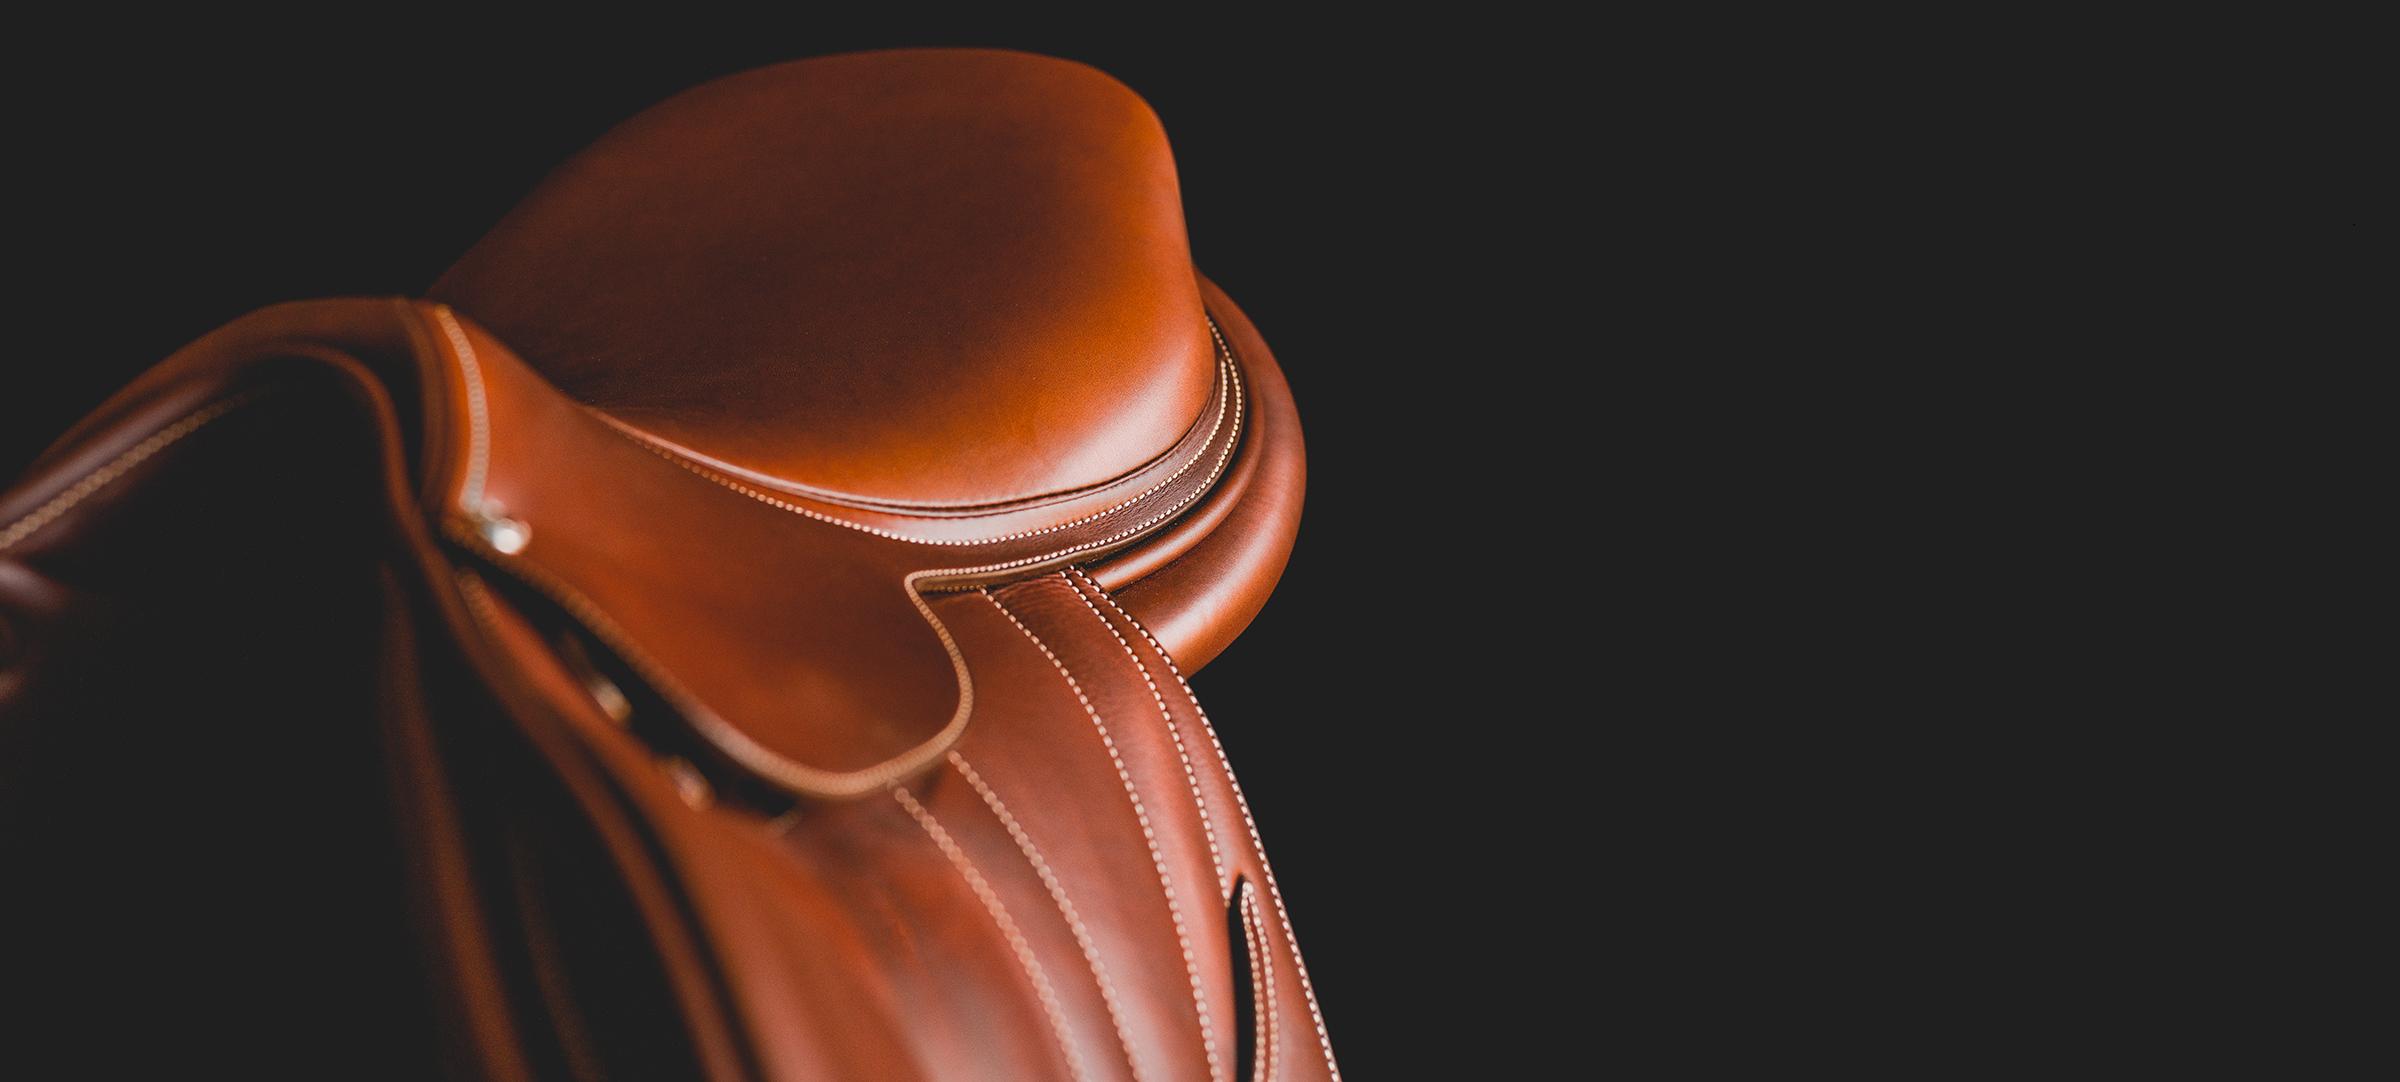 Made-on-mesure Butet saddles